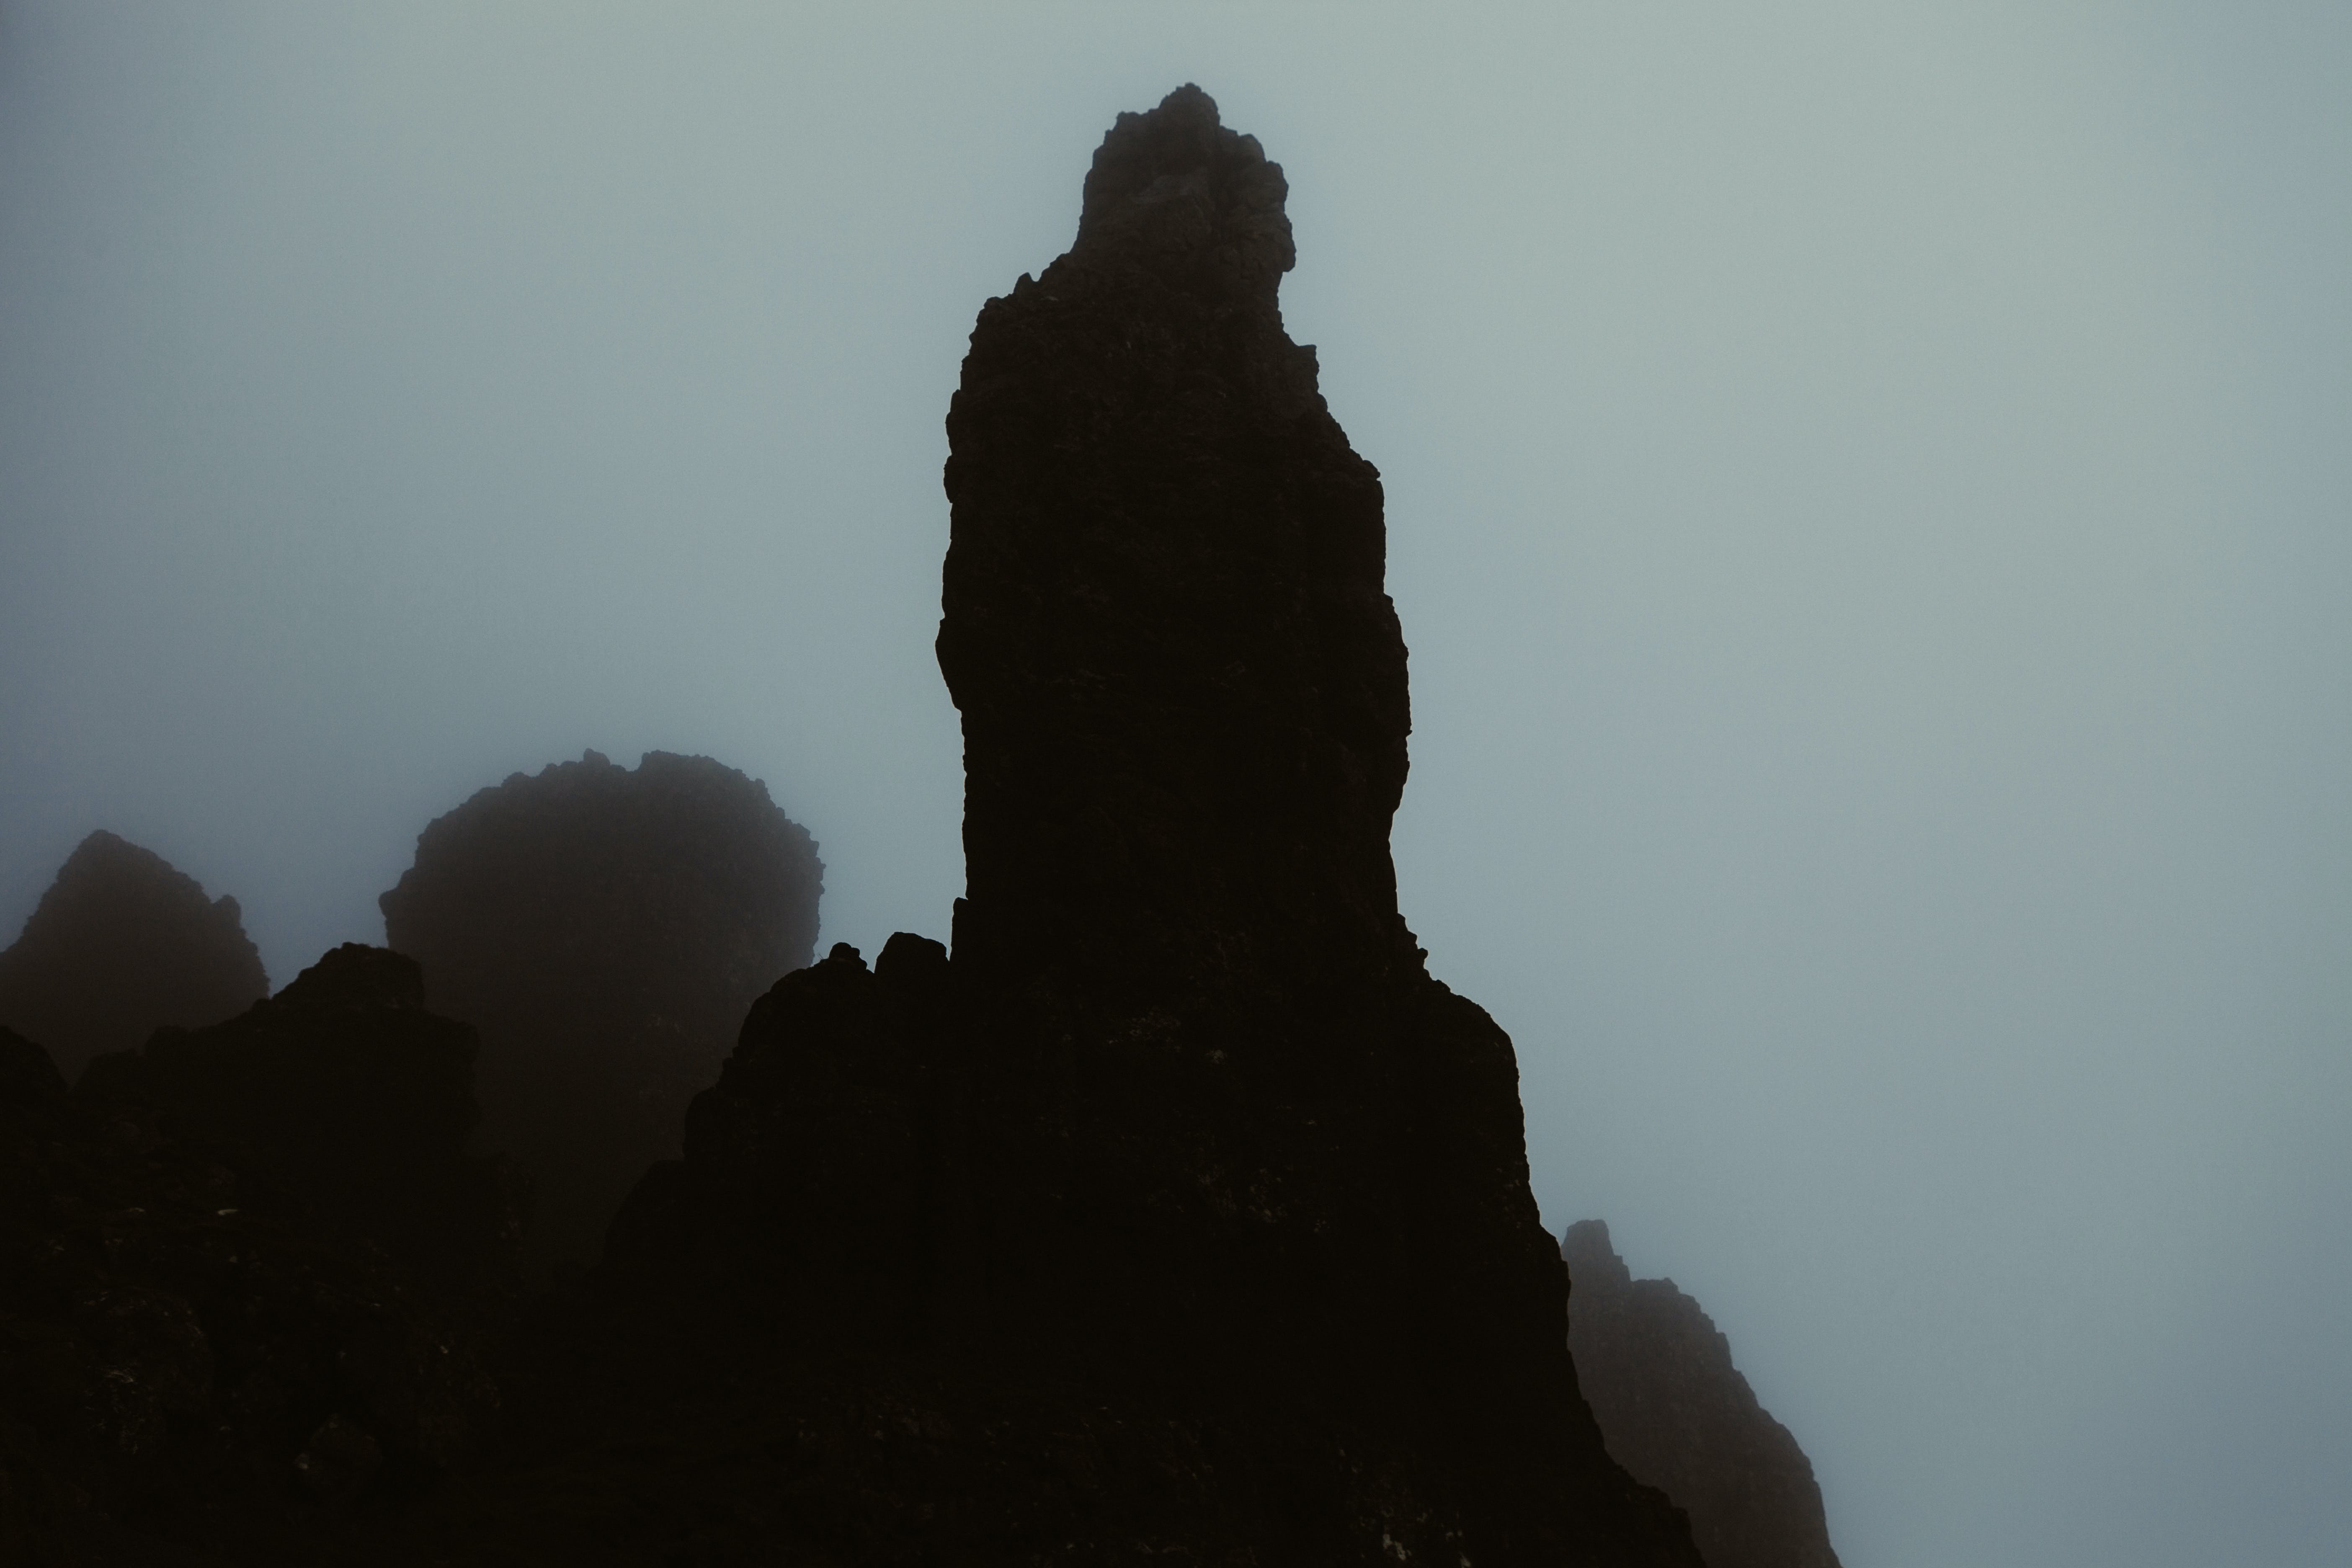 Kostenloses Stock Foto zu berge, dunkel, felsen, felswand